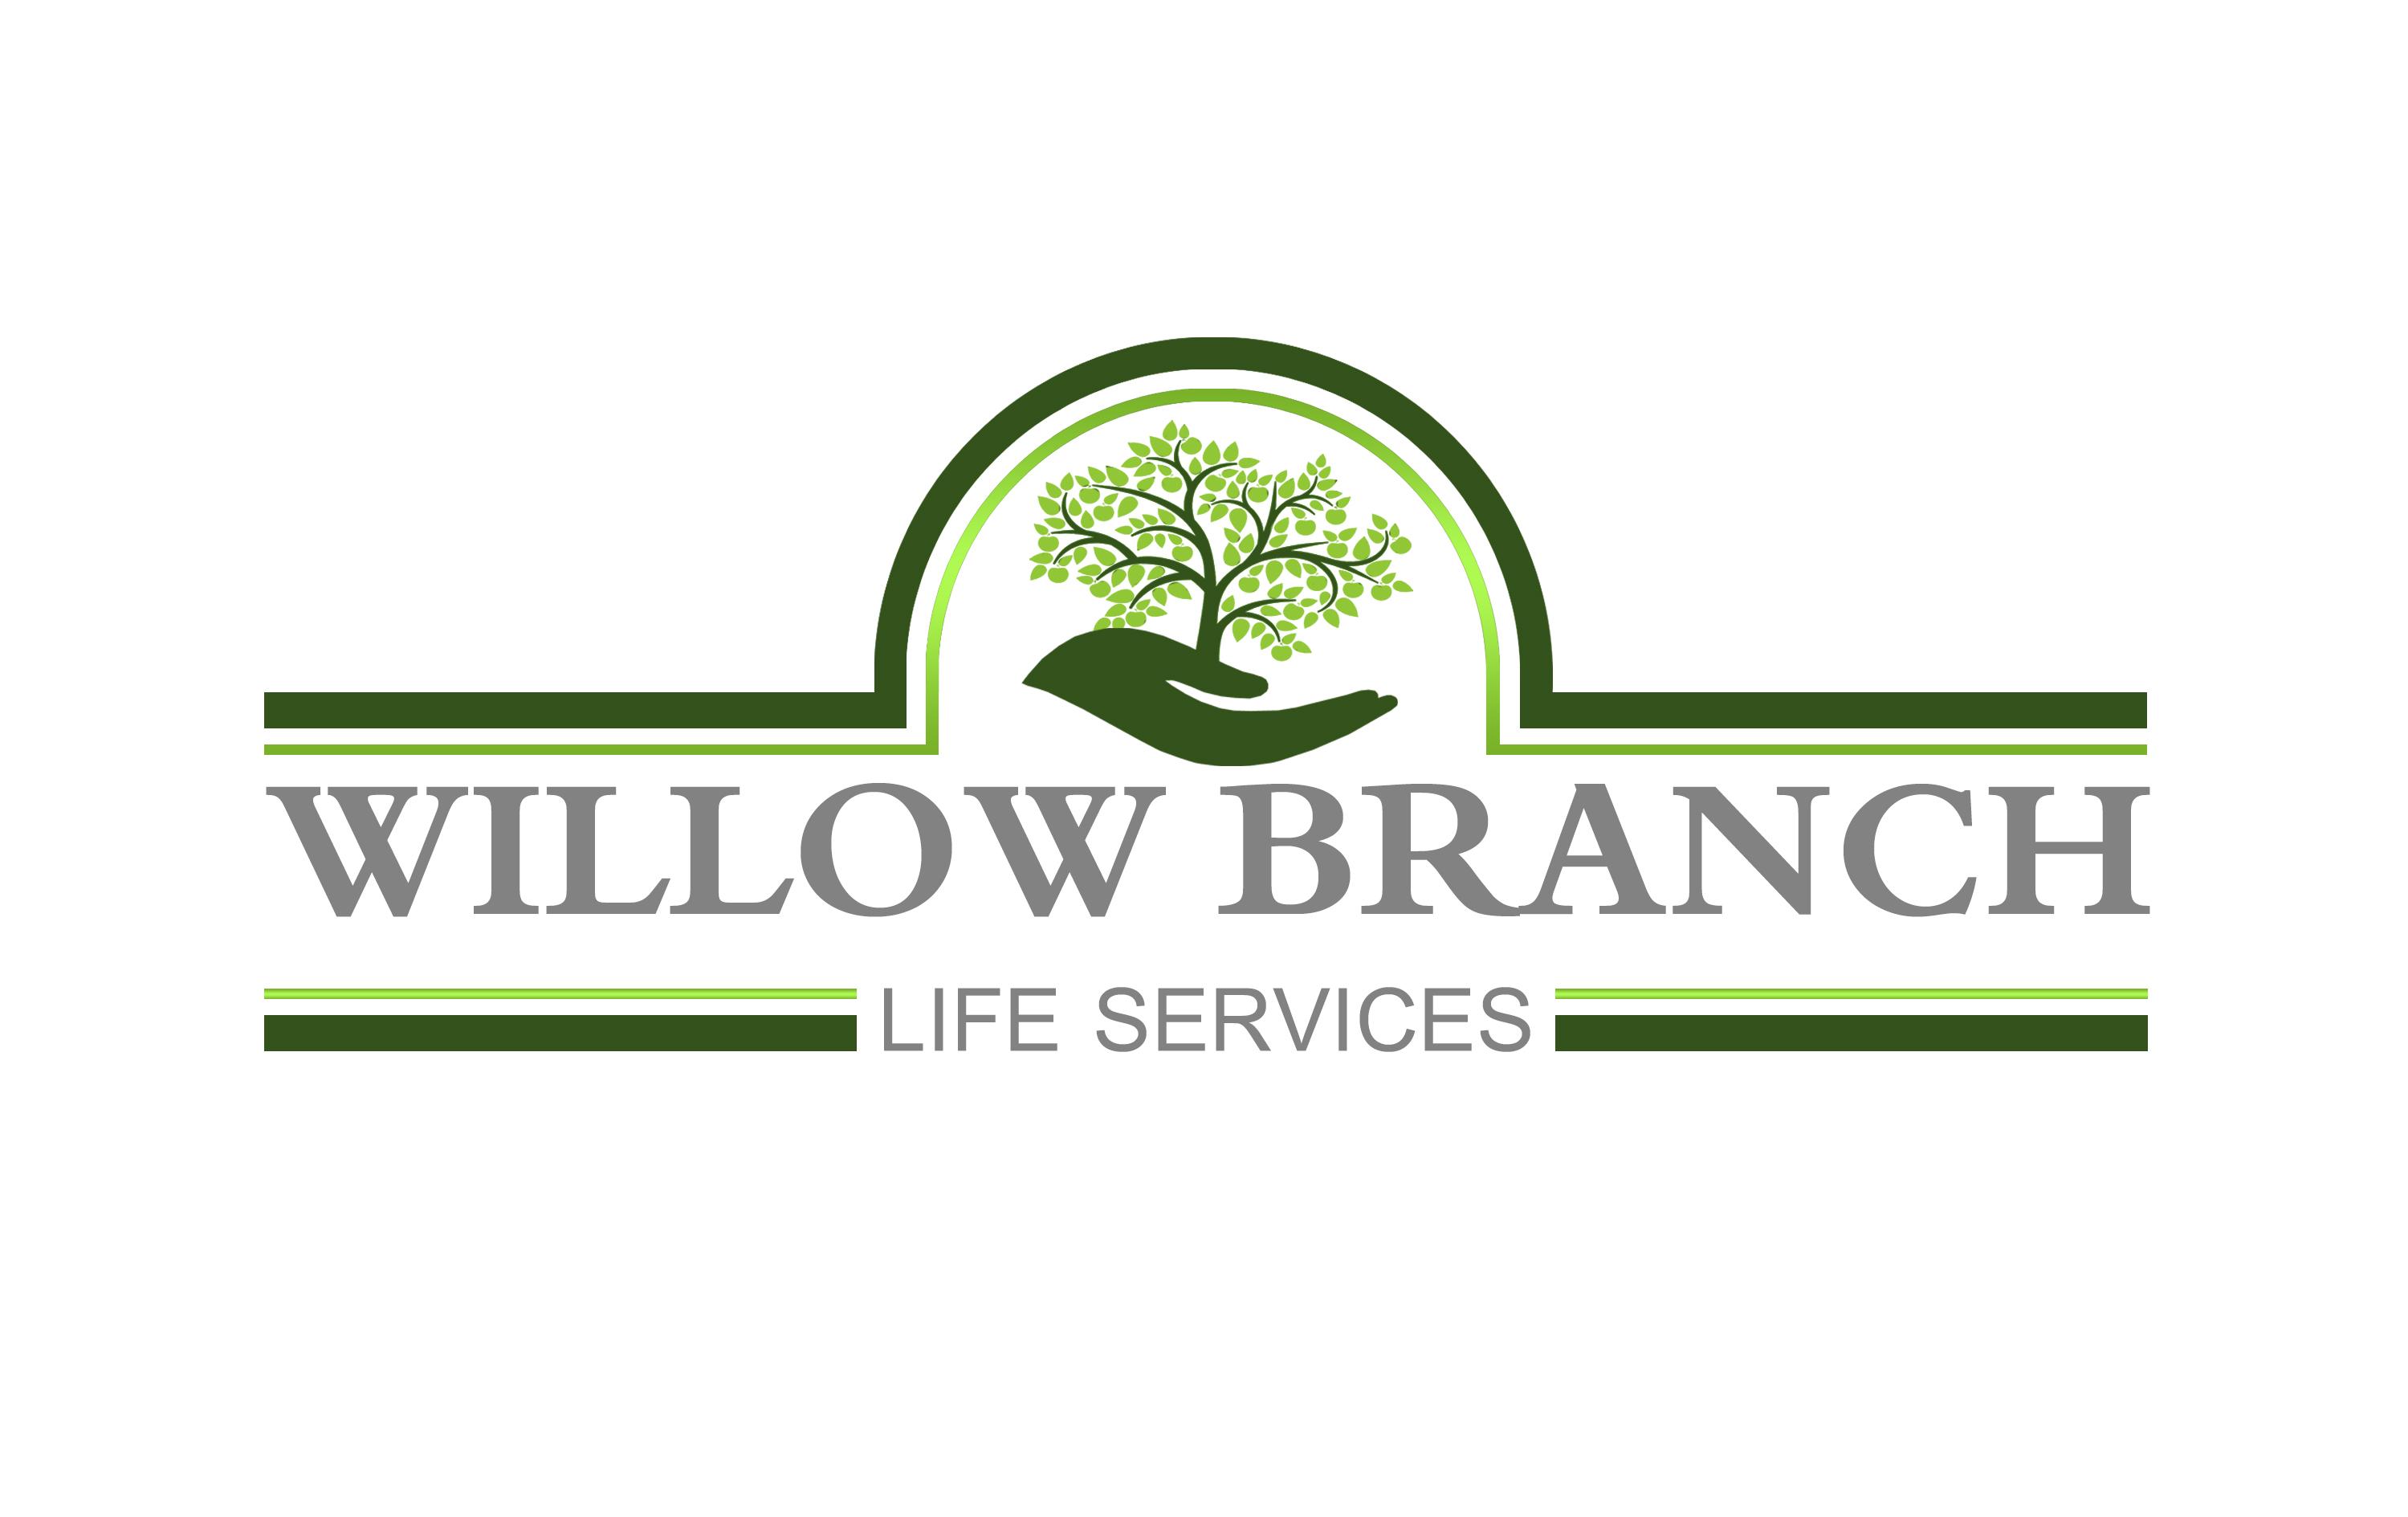 Logo Design by JSDESIGNGROUP - Entry No. 356 in the Logo Design Contest Artistic Logo Design for Willow Branch Life Service.